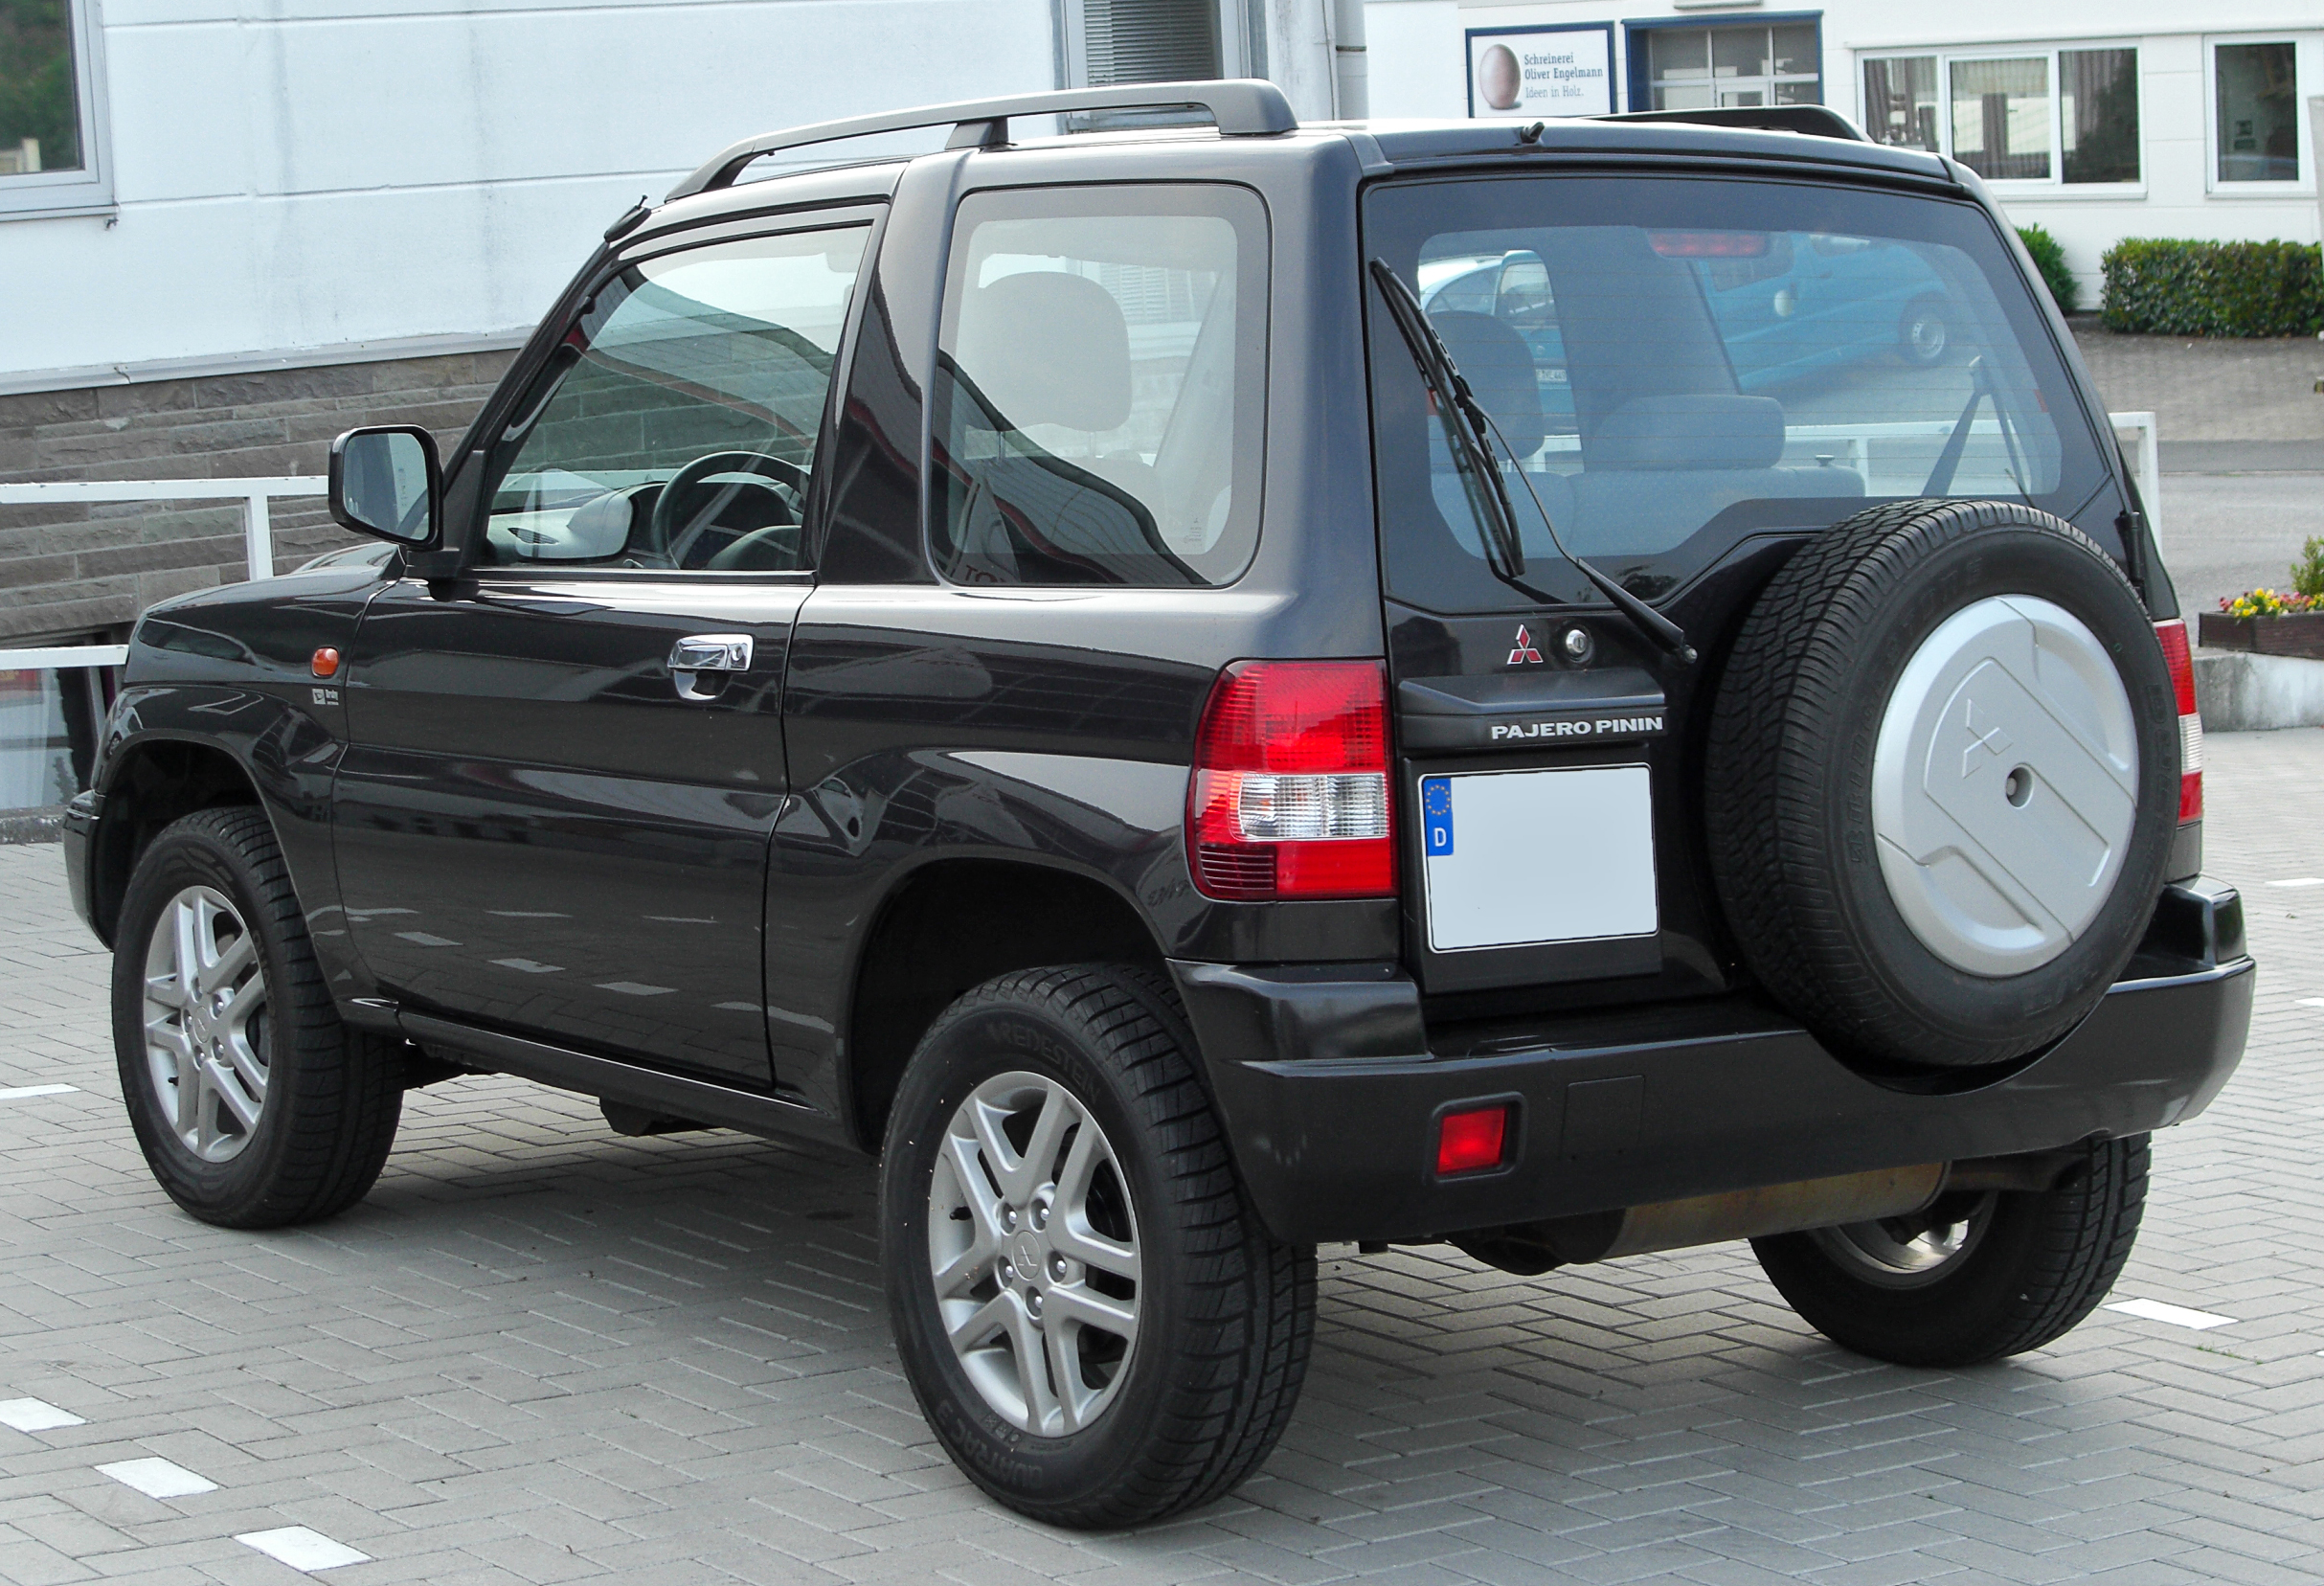 Cerchi Range Rover, Porsche, Bmw, Audi, Land rover, Mak-Highlands